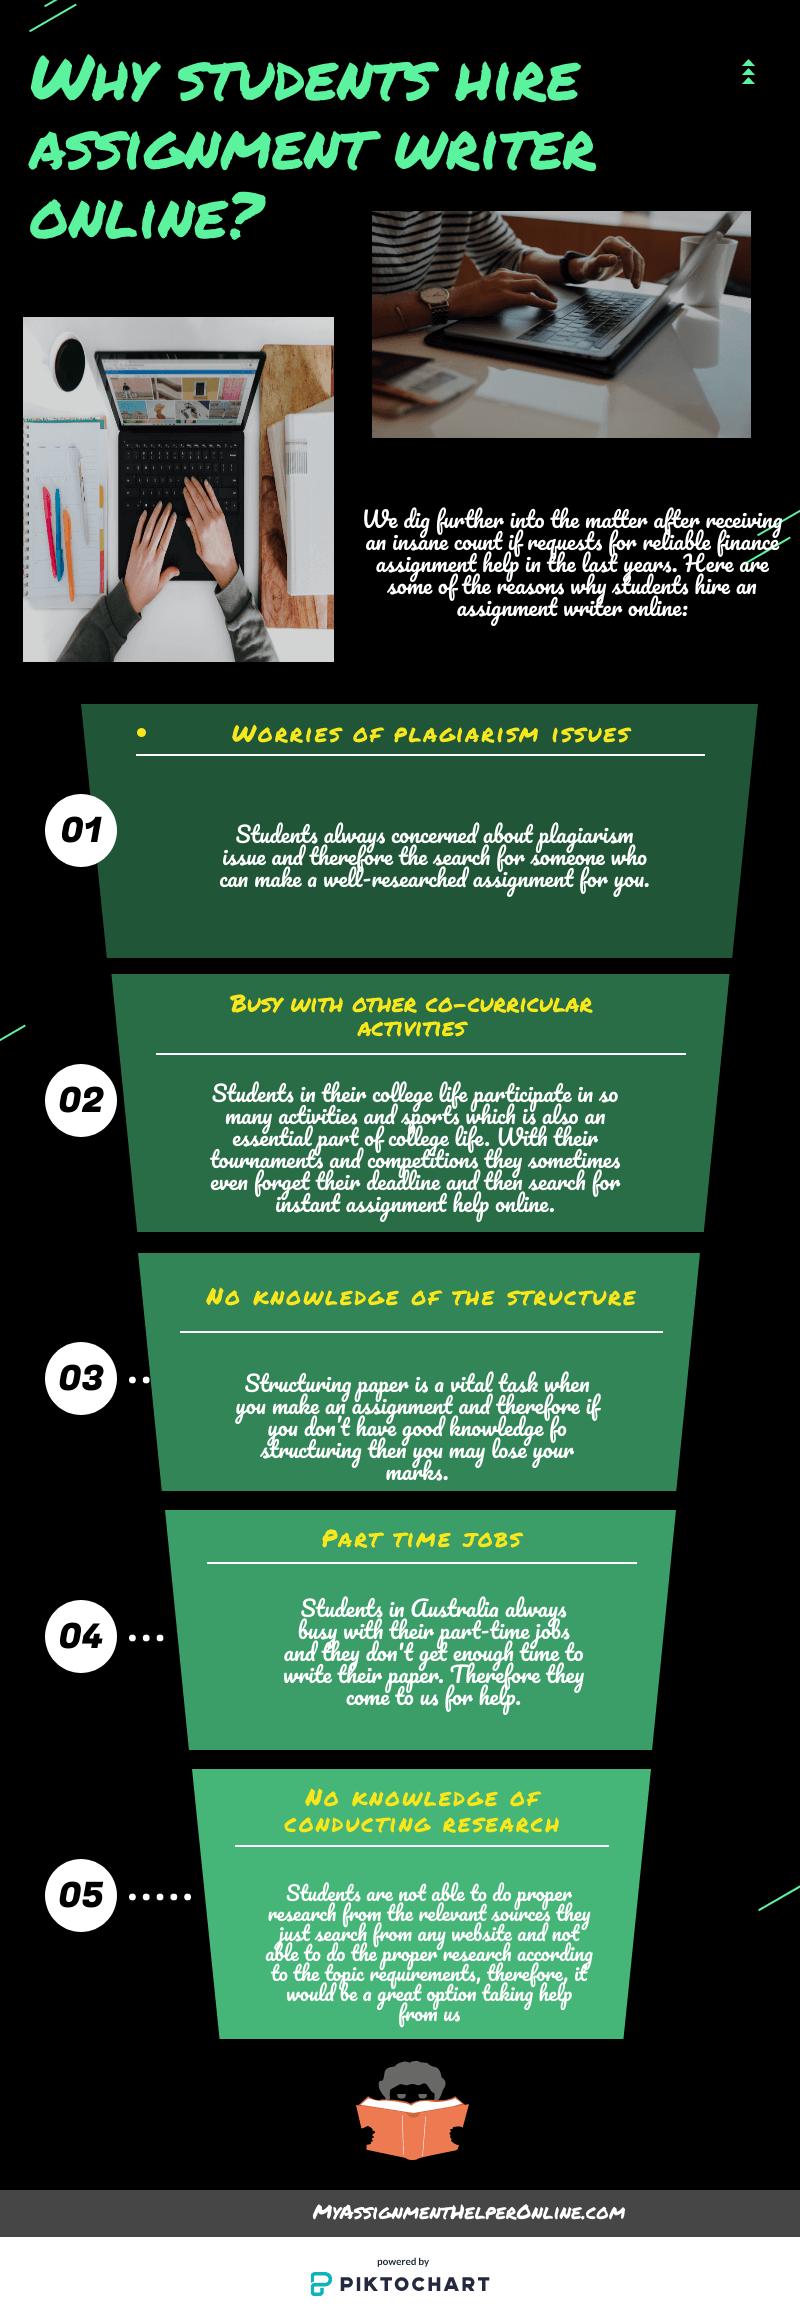 assignment-writer